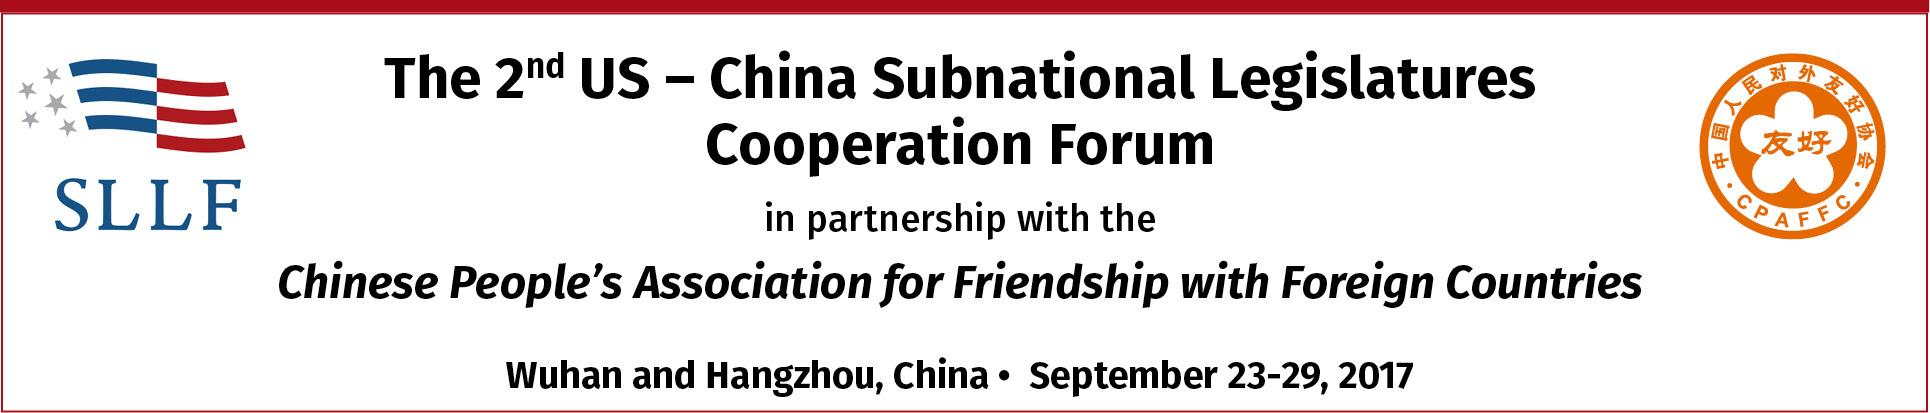 US China Forum header